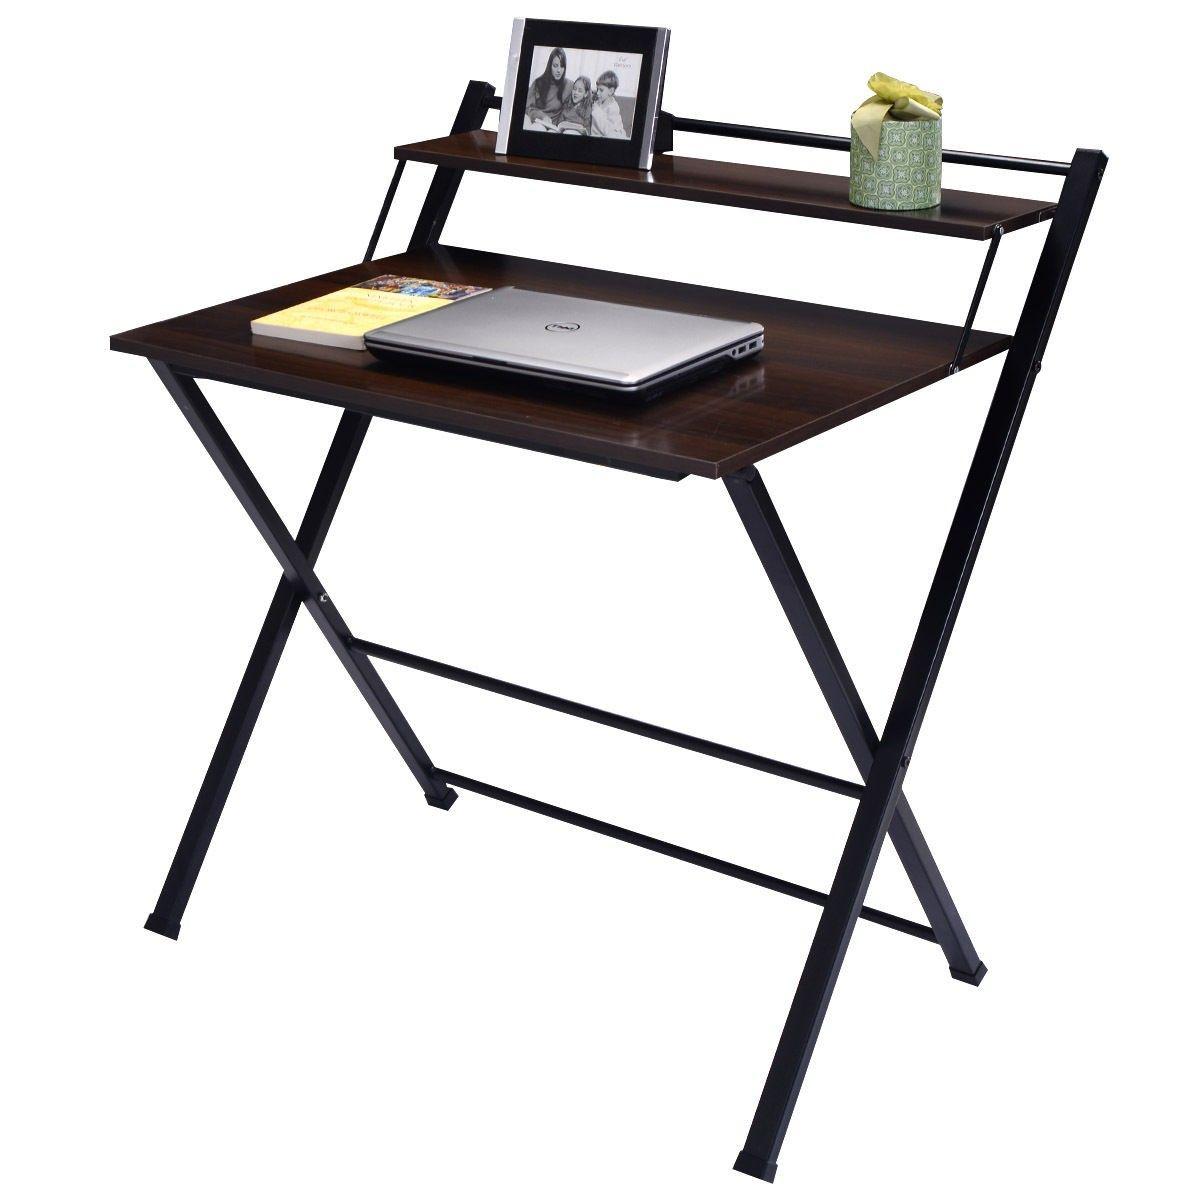 2 Tier Foldable Desk Computer Office